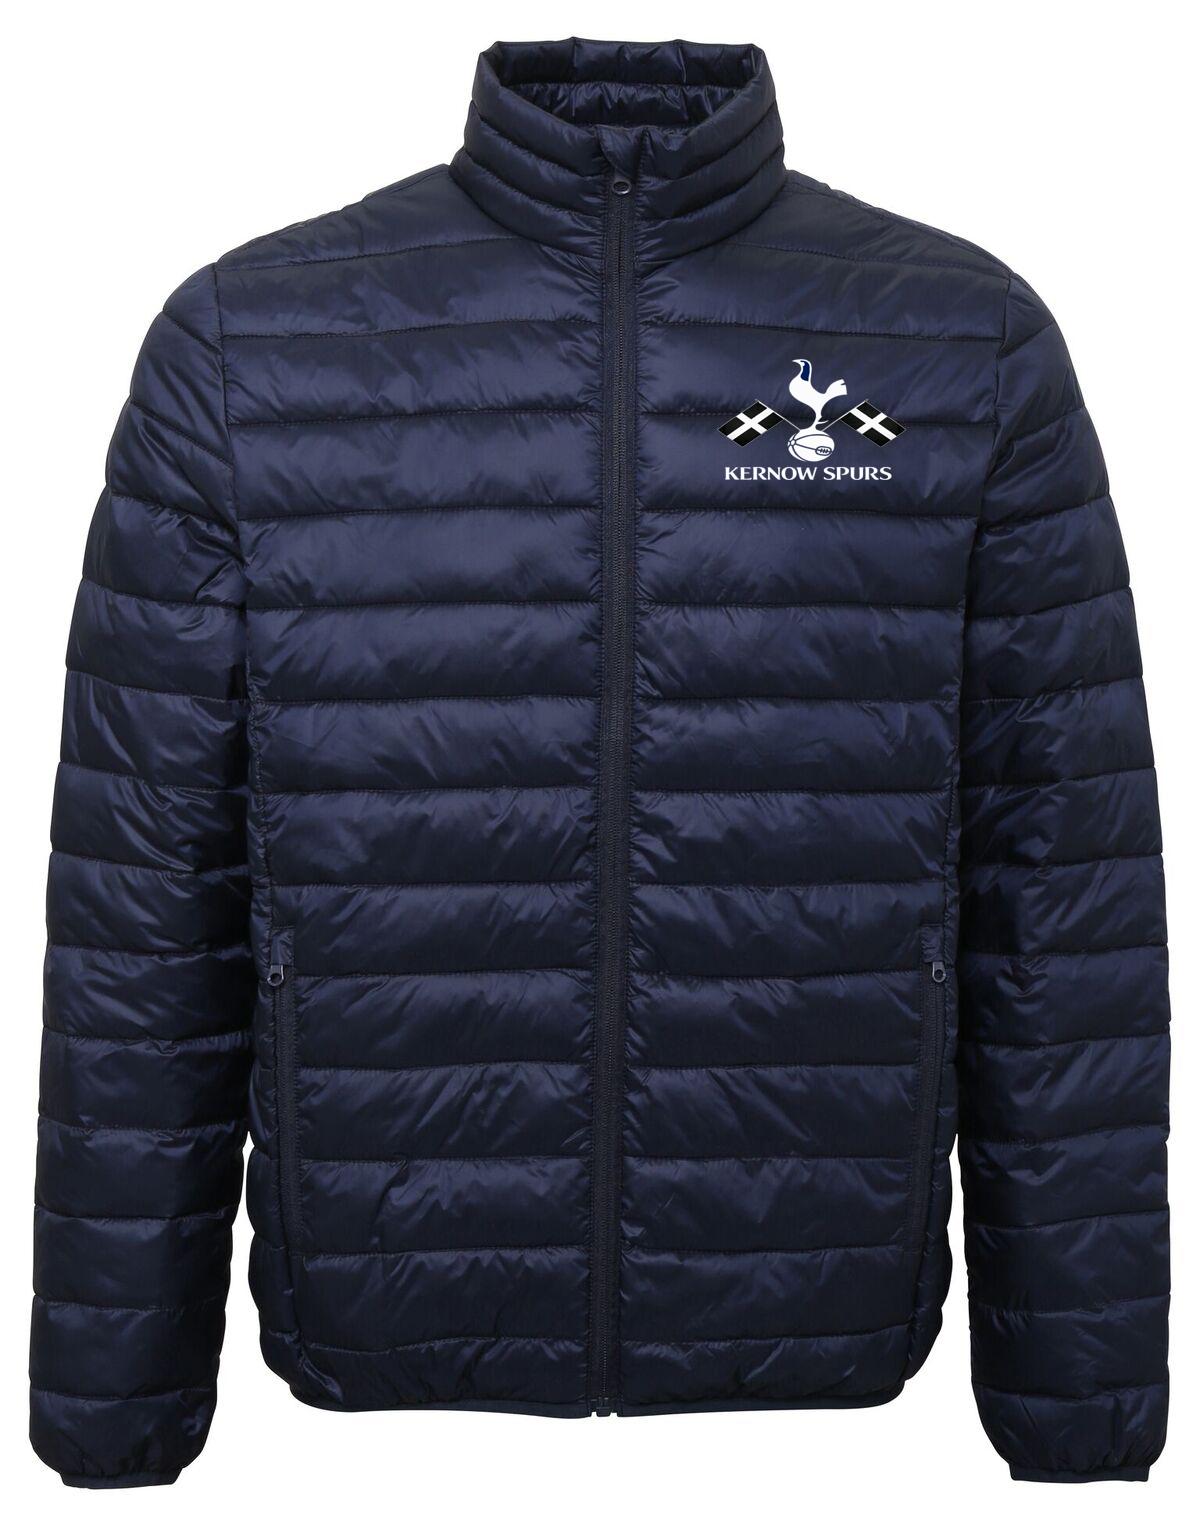 Kernow Spurs Terrain Jacket